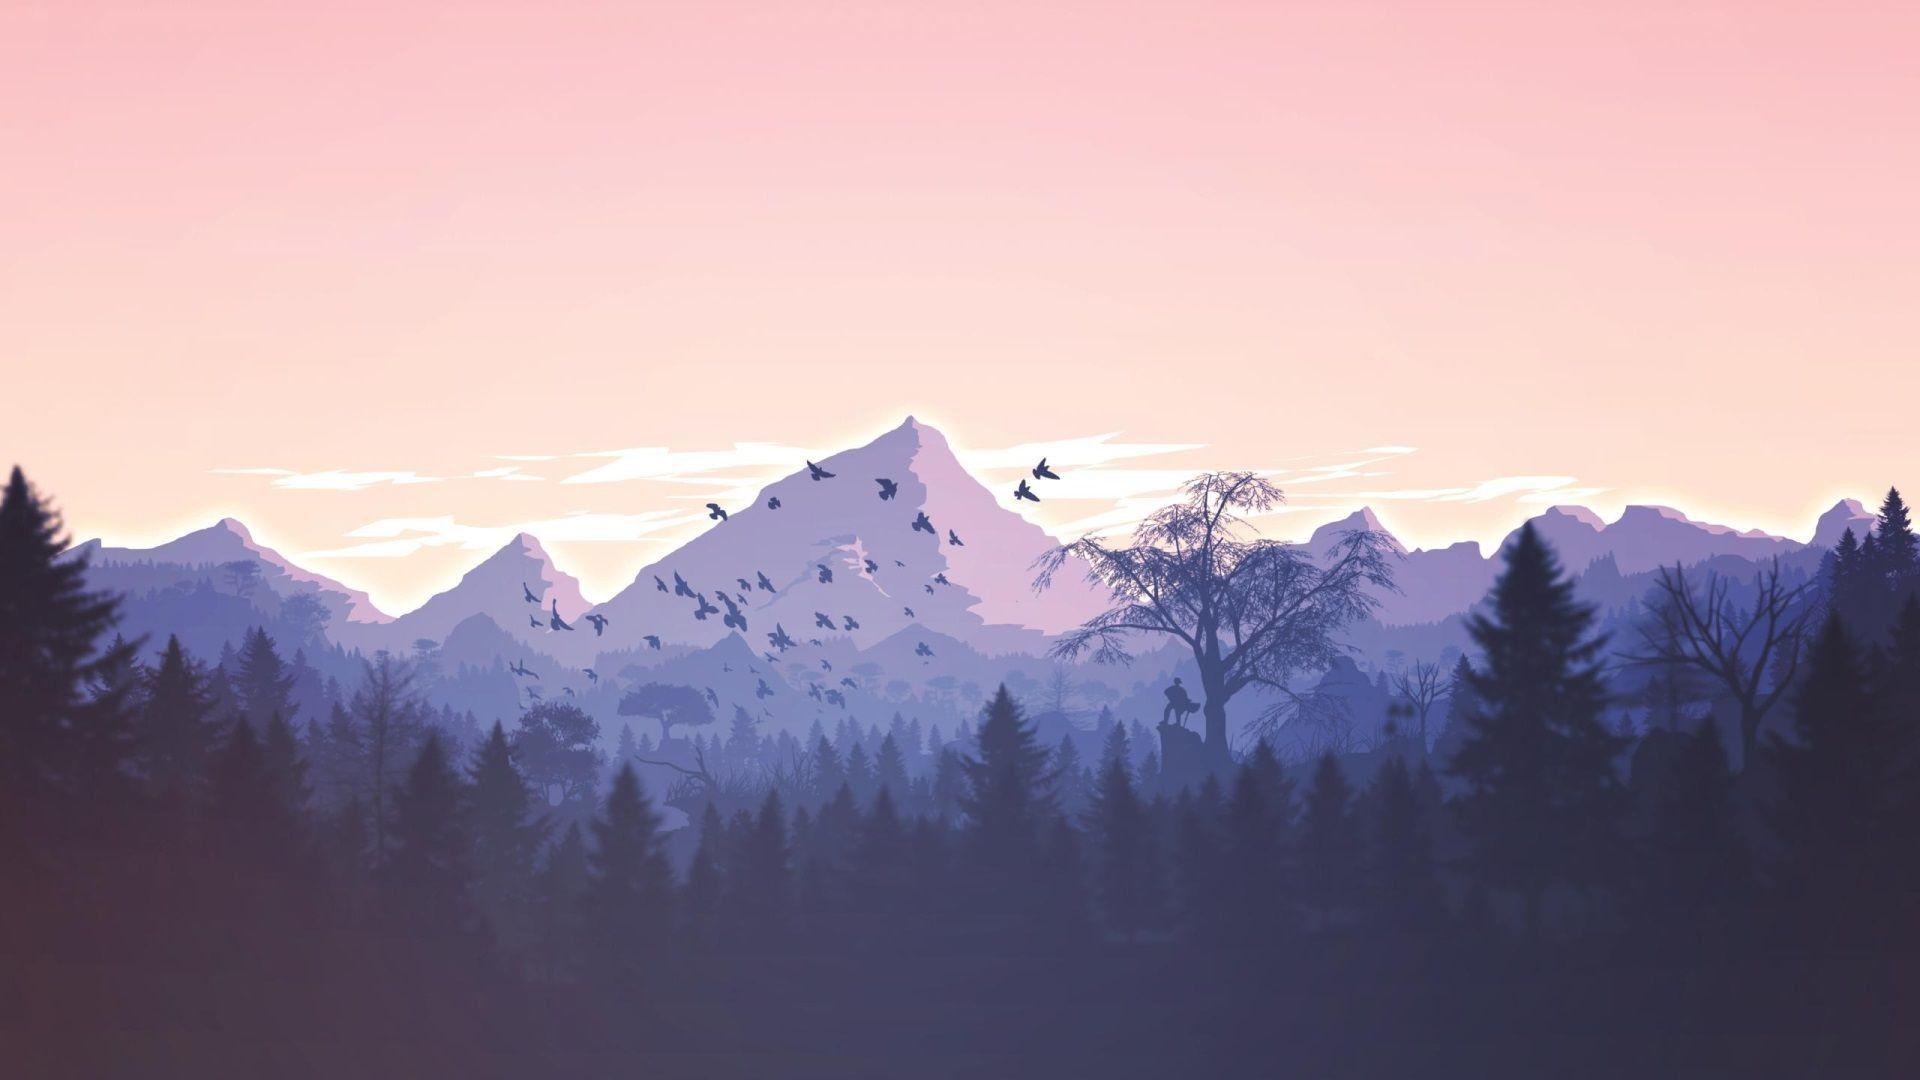 Simple Nature Desktop Wallpapers Top Free Simple Nature Desktop Backgrounds Wallpaperaccess